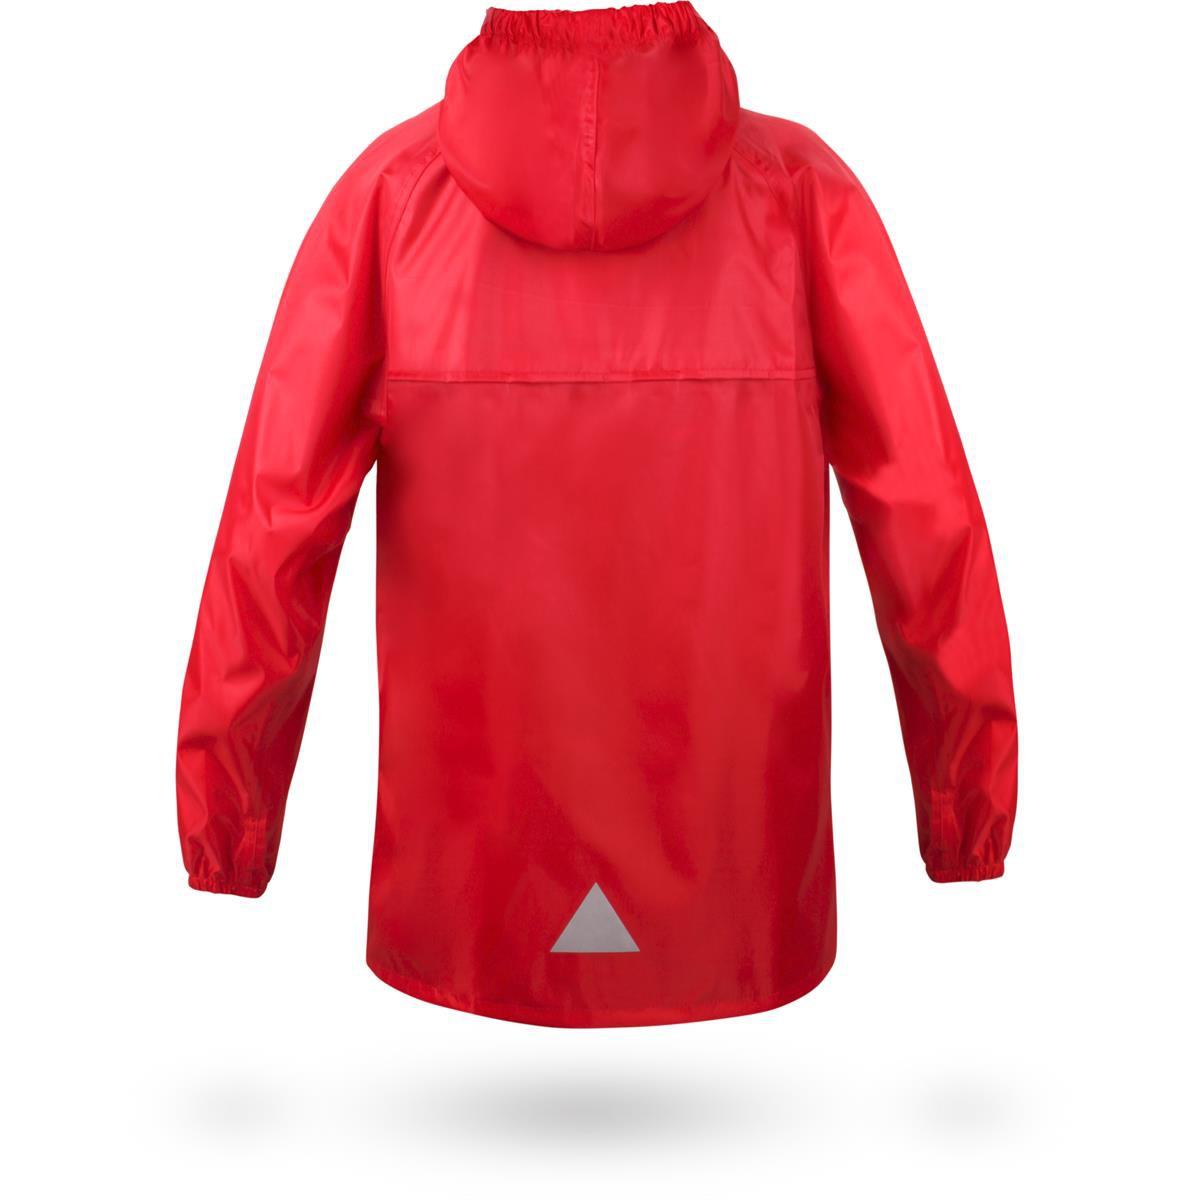 "Kinder Regenjacke ""Seattle"" - Rot für 22,85€"